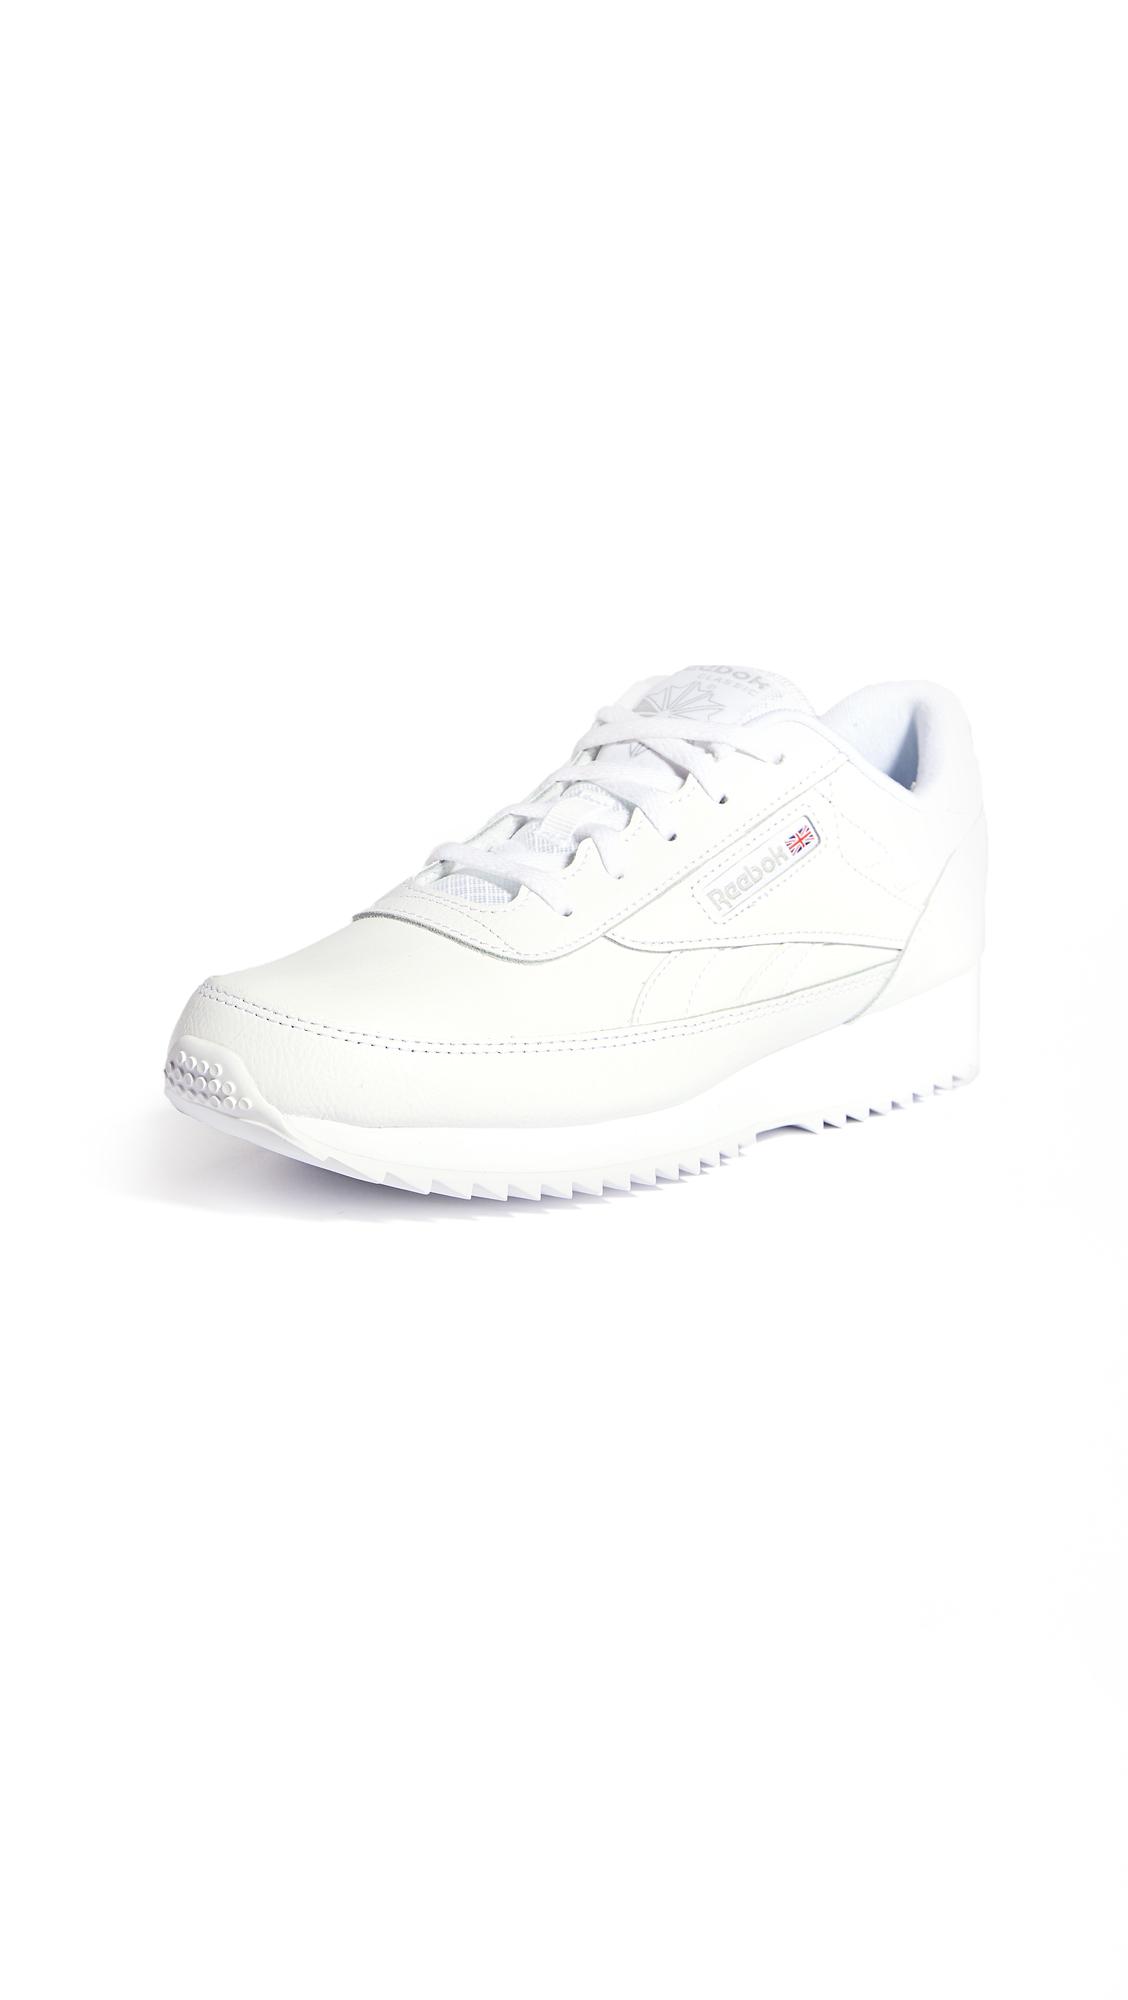 Reebok Renaissance Ripple Sneakers